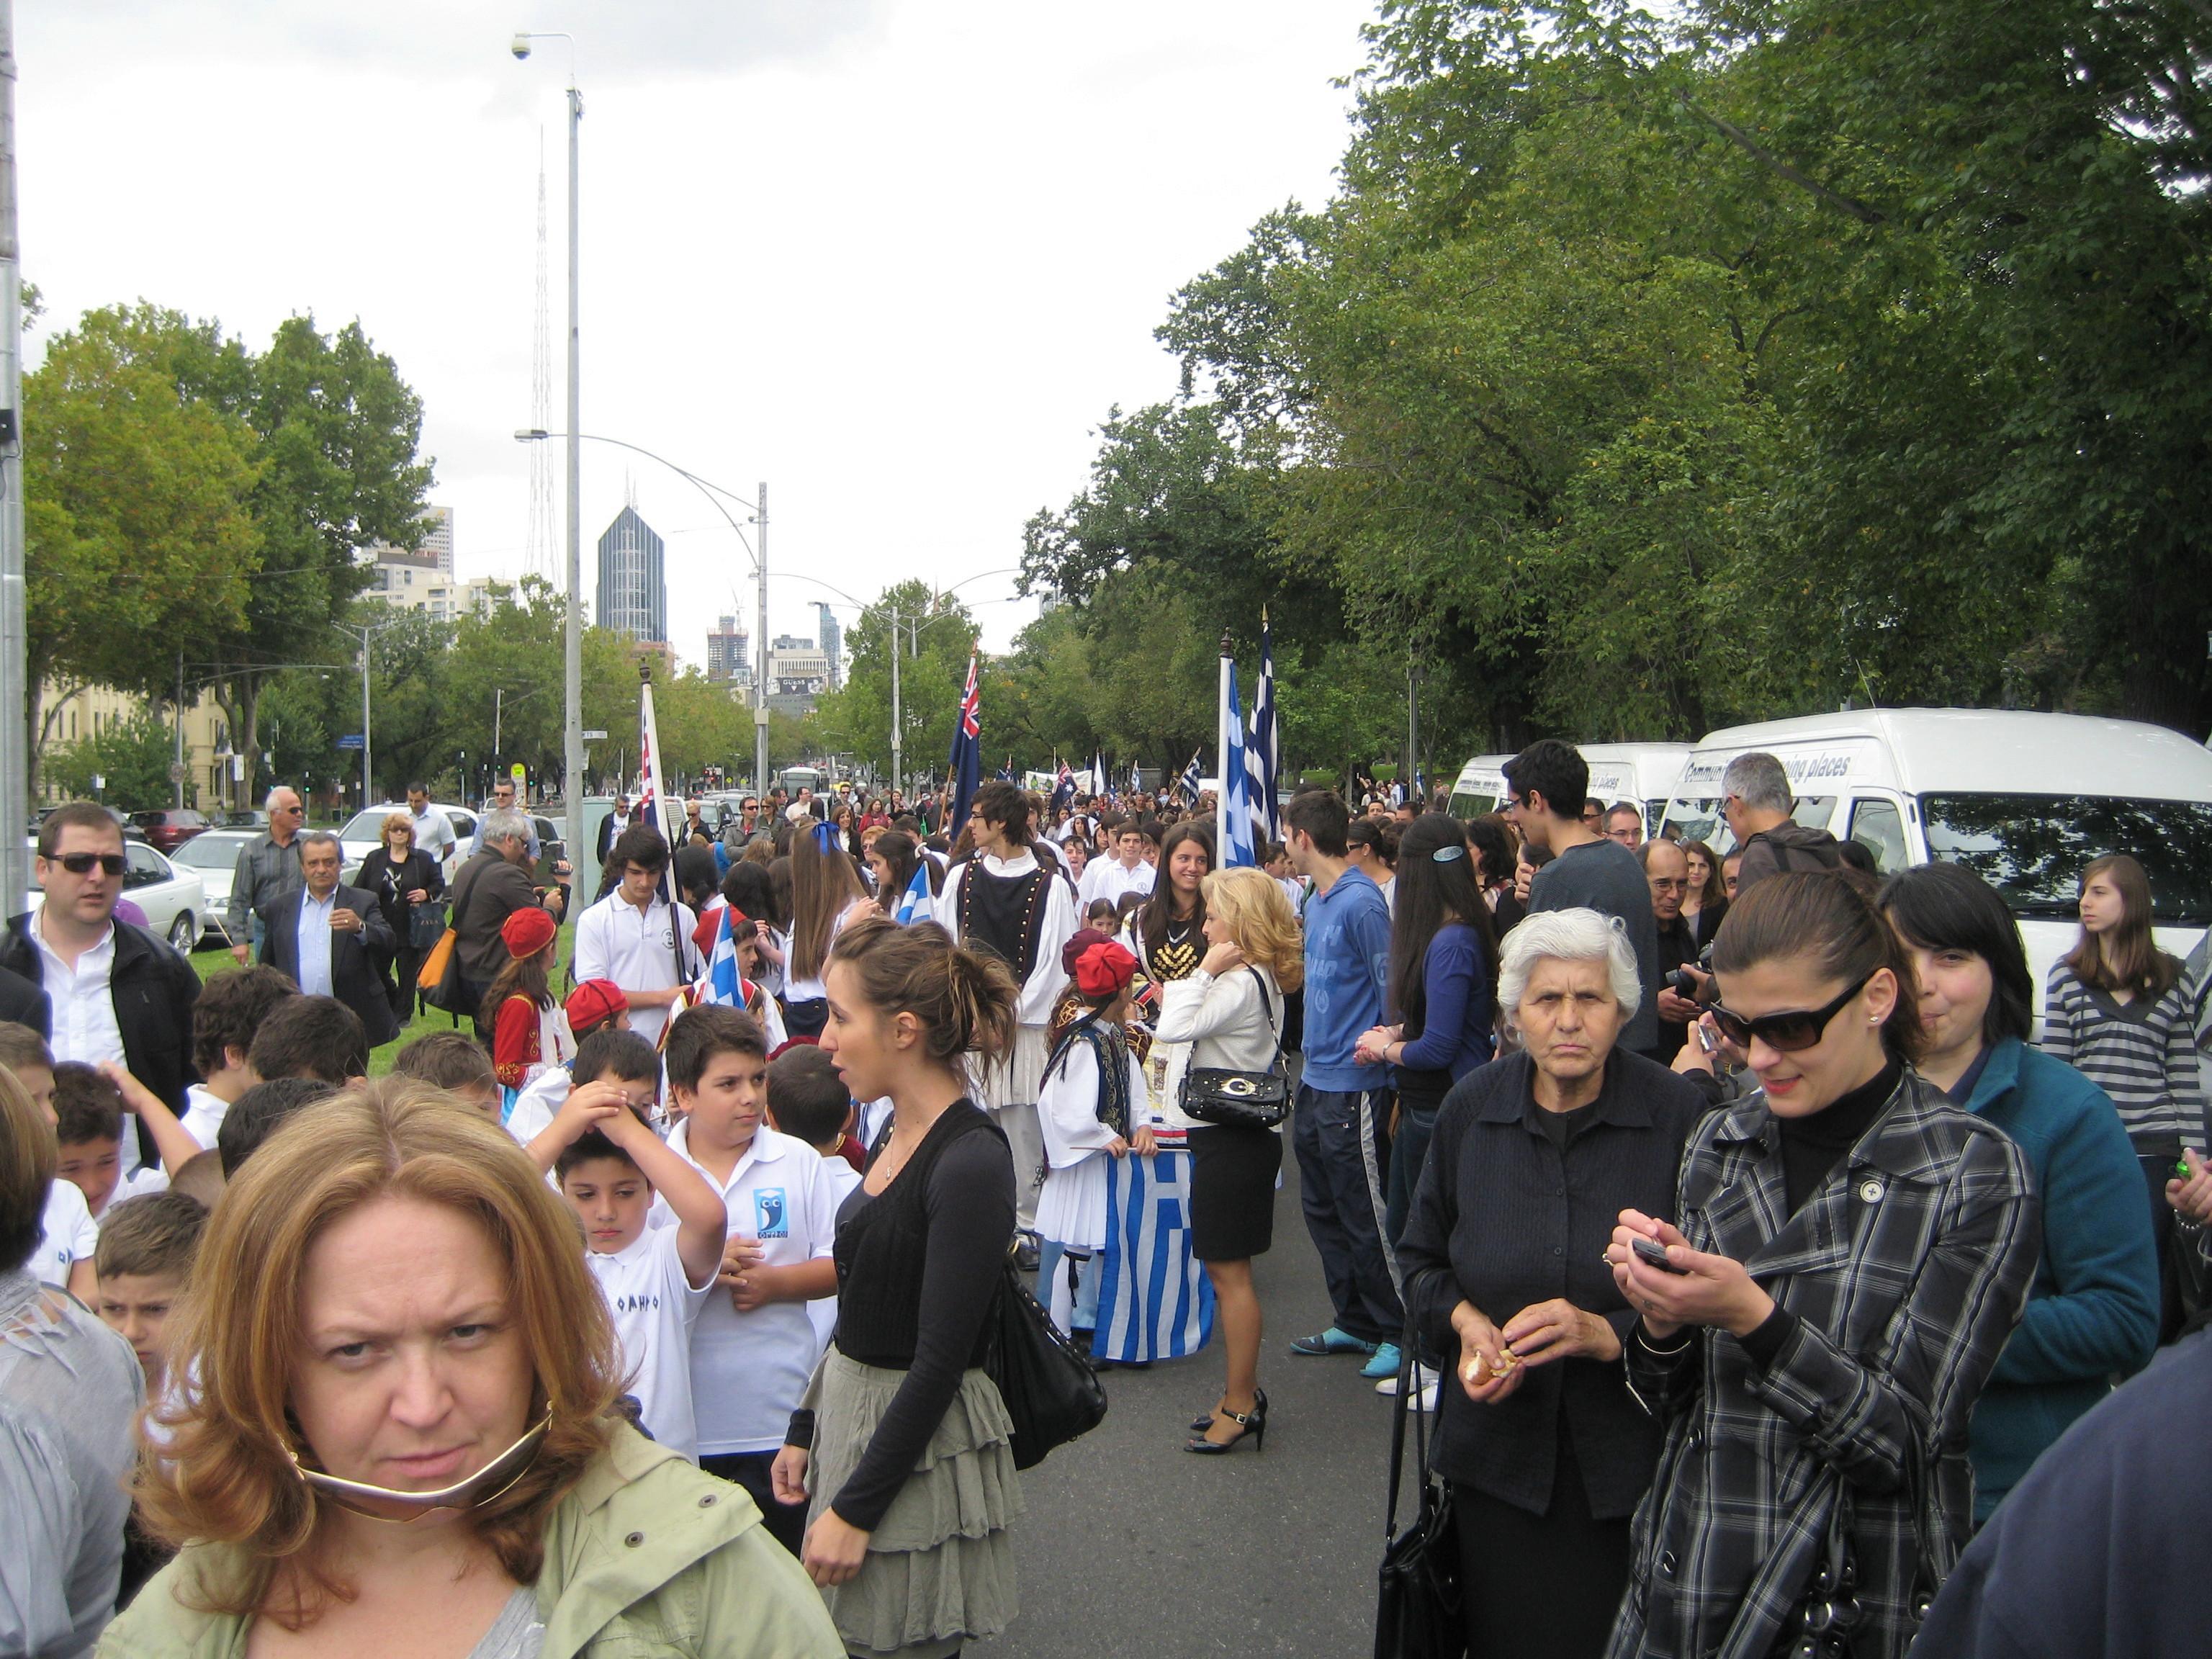 IMG 1427 Οι Εορτασμοί στην Μελβούρνη για την επέτειο της 25ης Μαρτίου